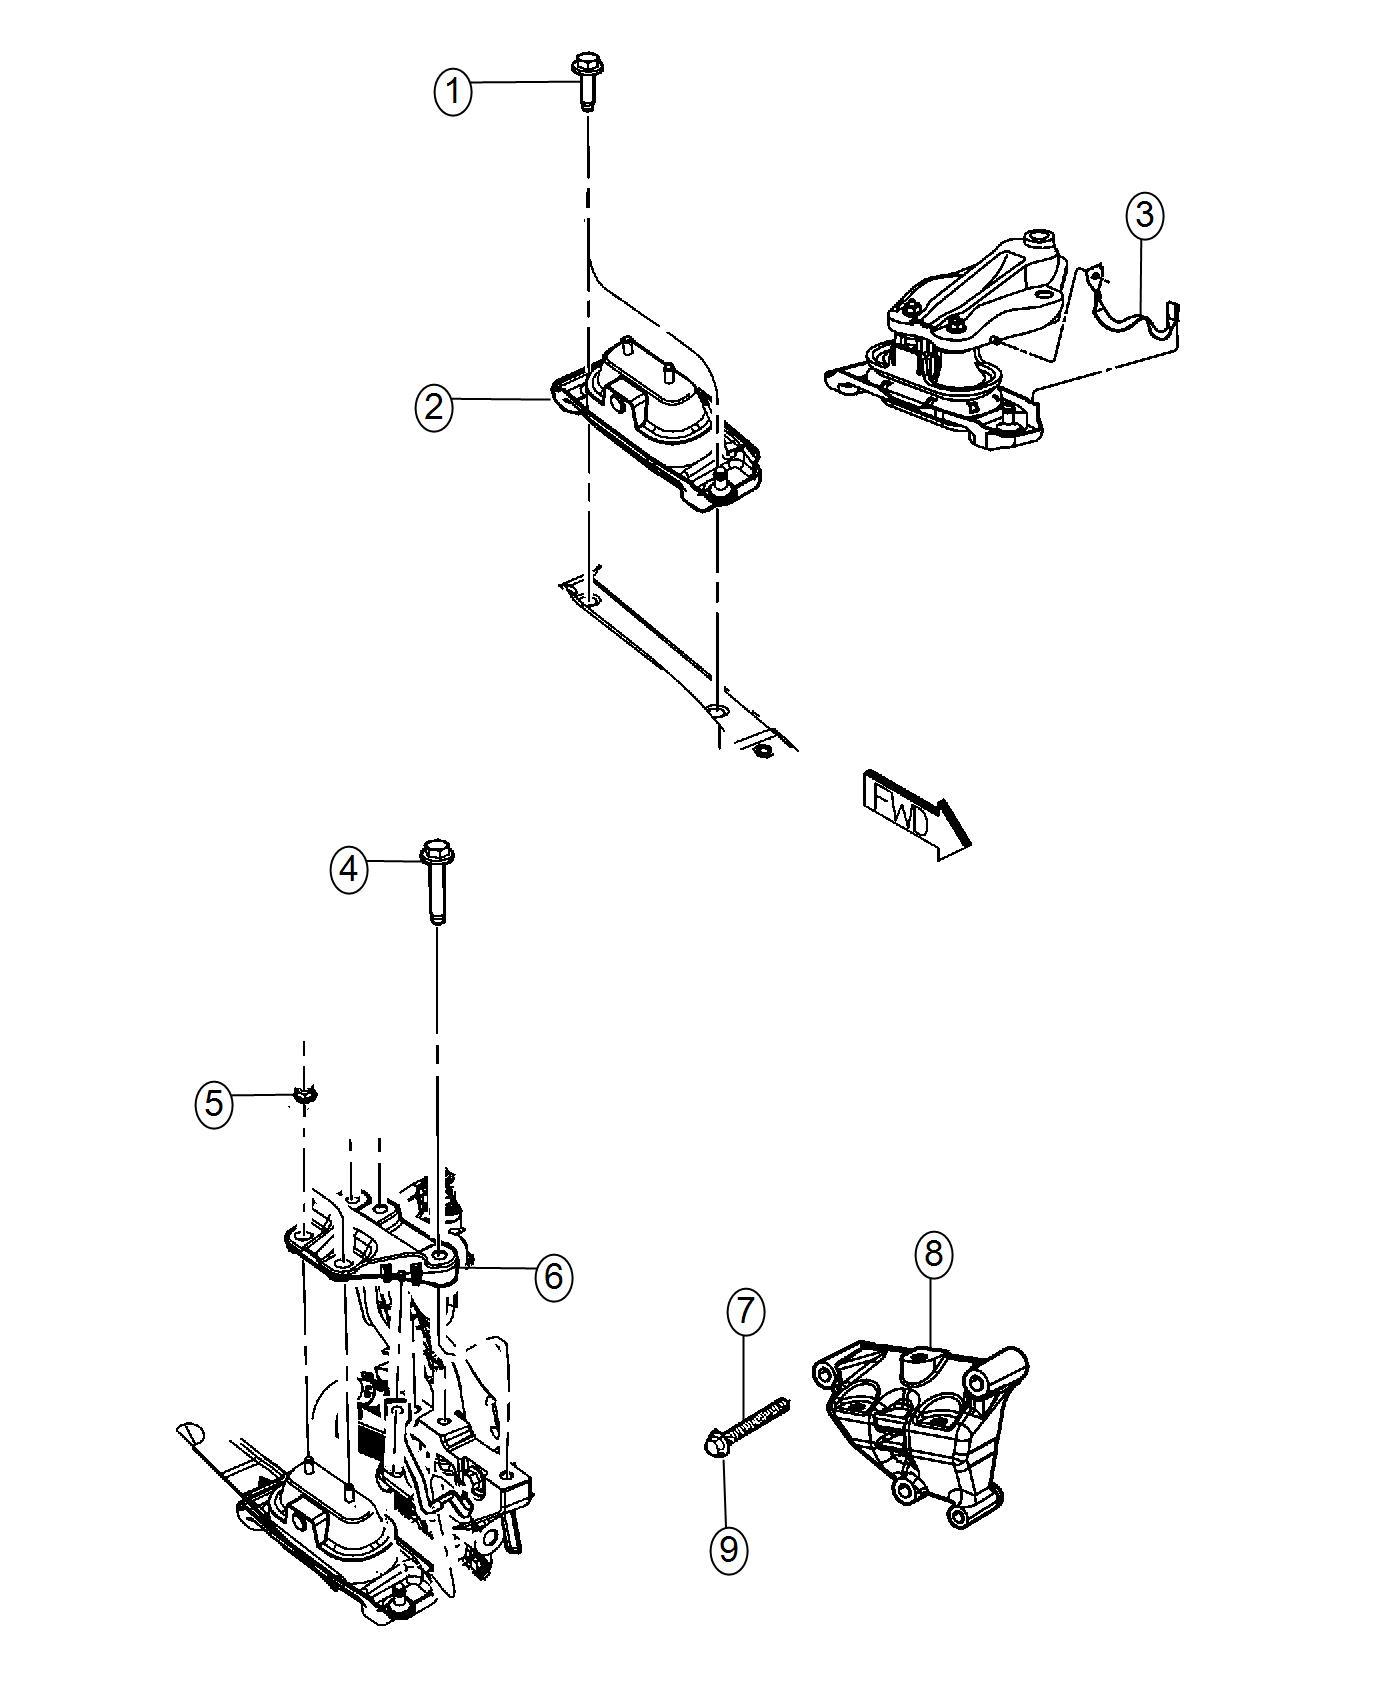 2017 Dodge Grand Caravan Engine mount. Right. Fwd